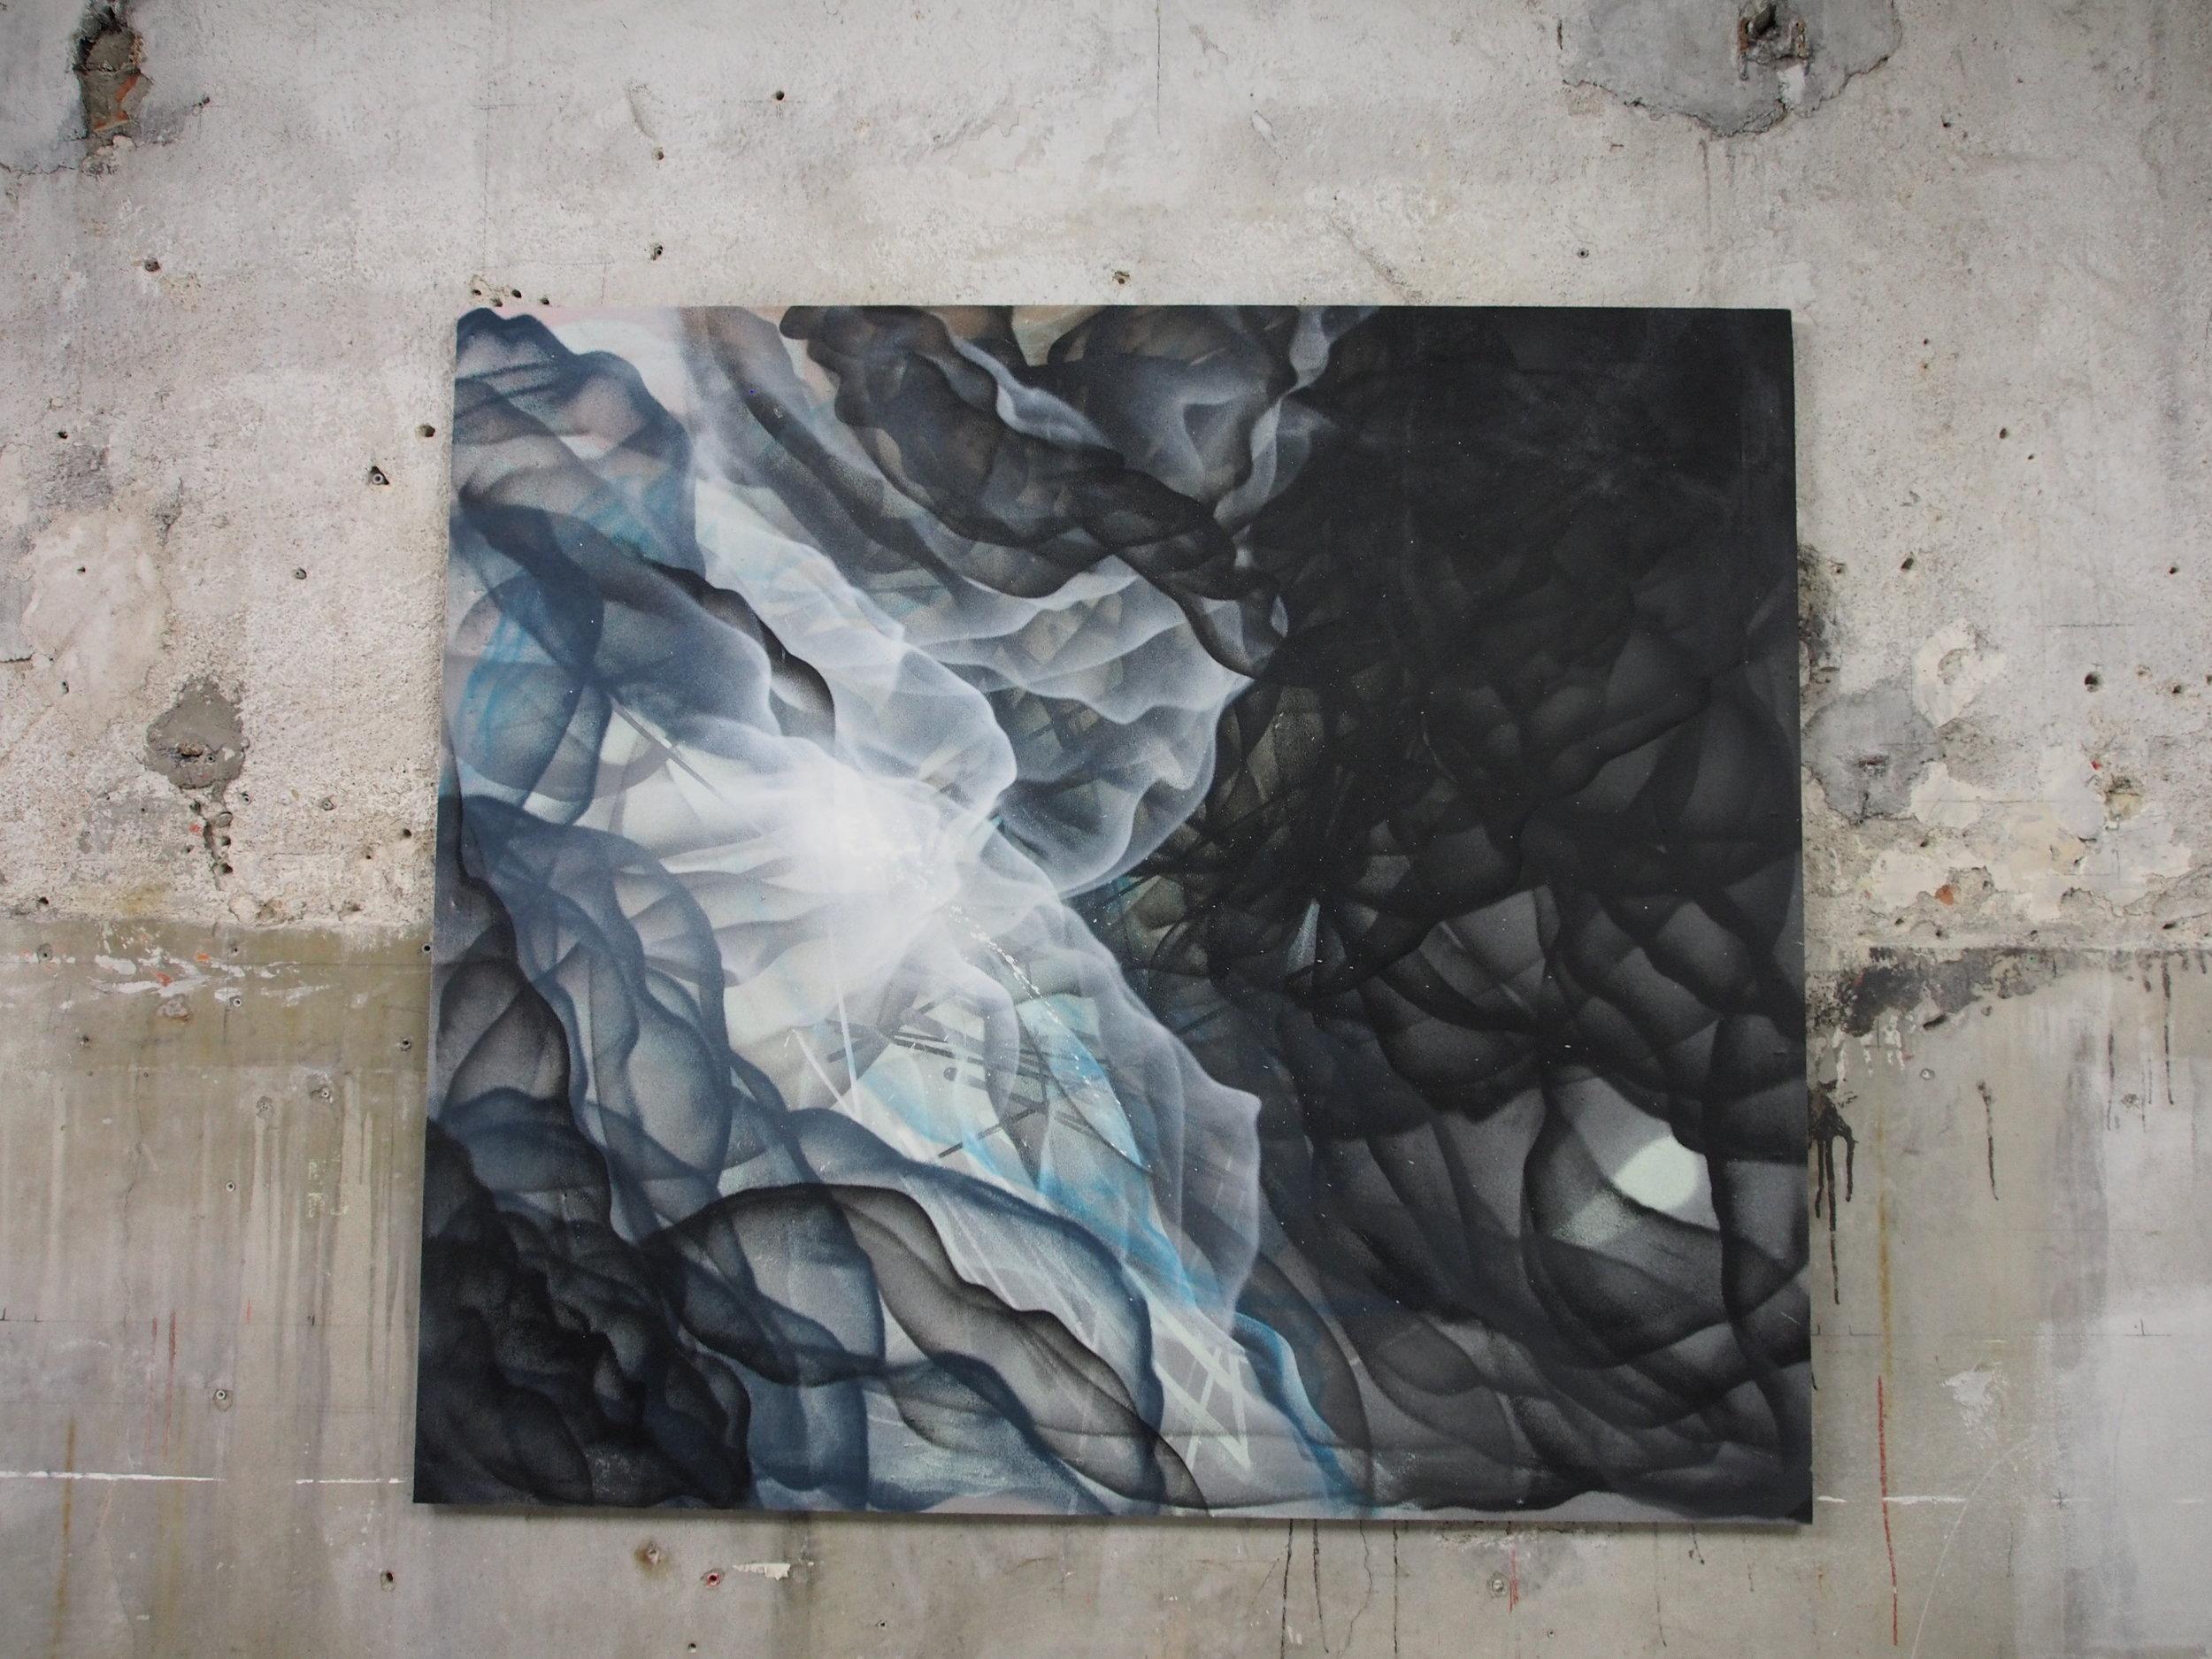 L - 150x170cm - Spray on polycarbonateSpray on canvas